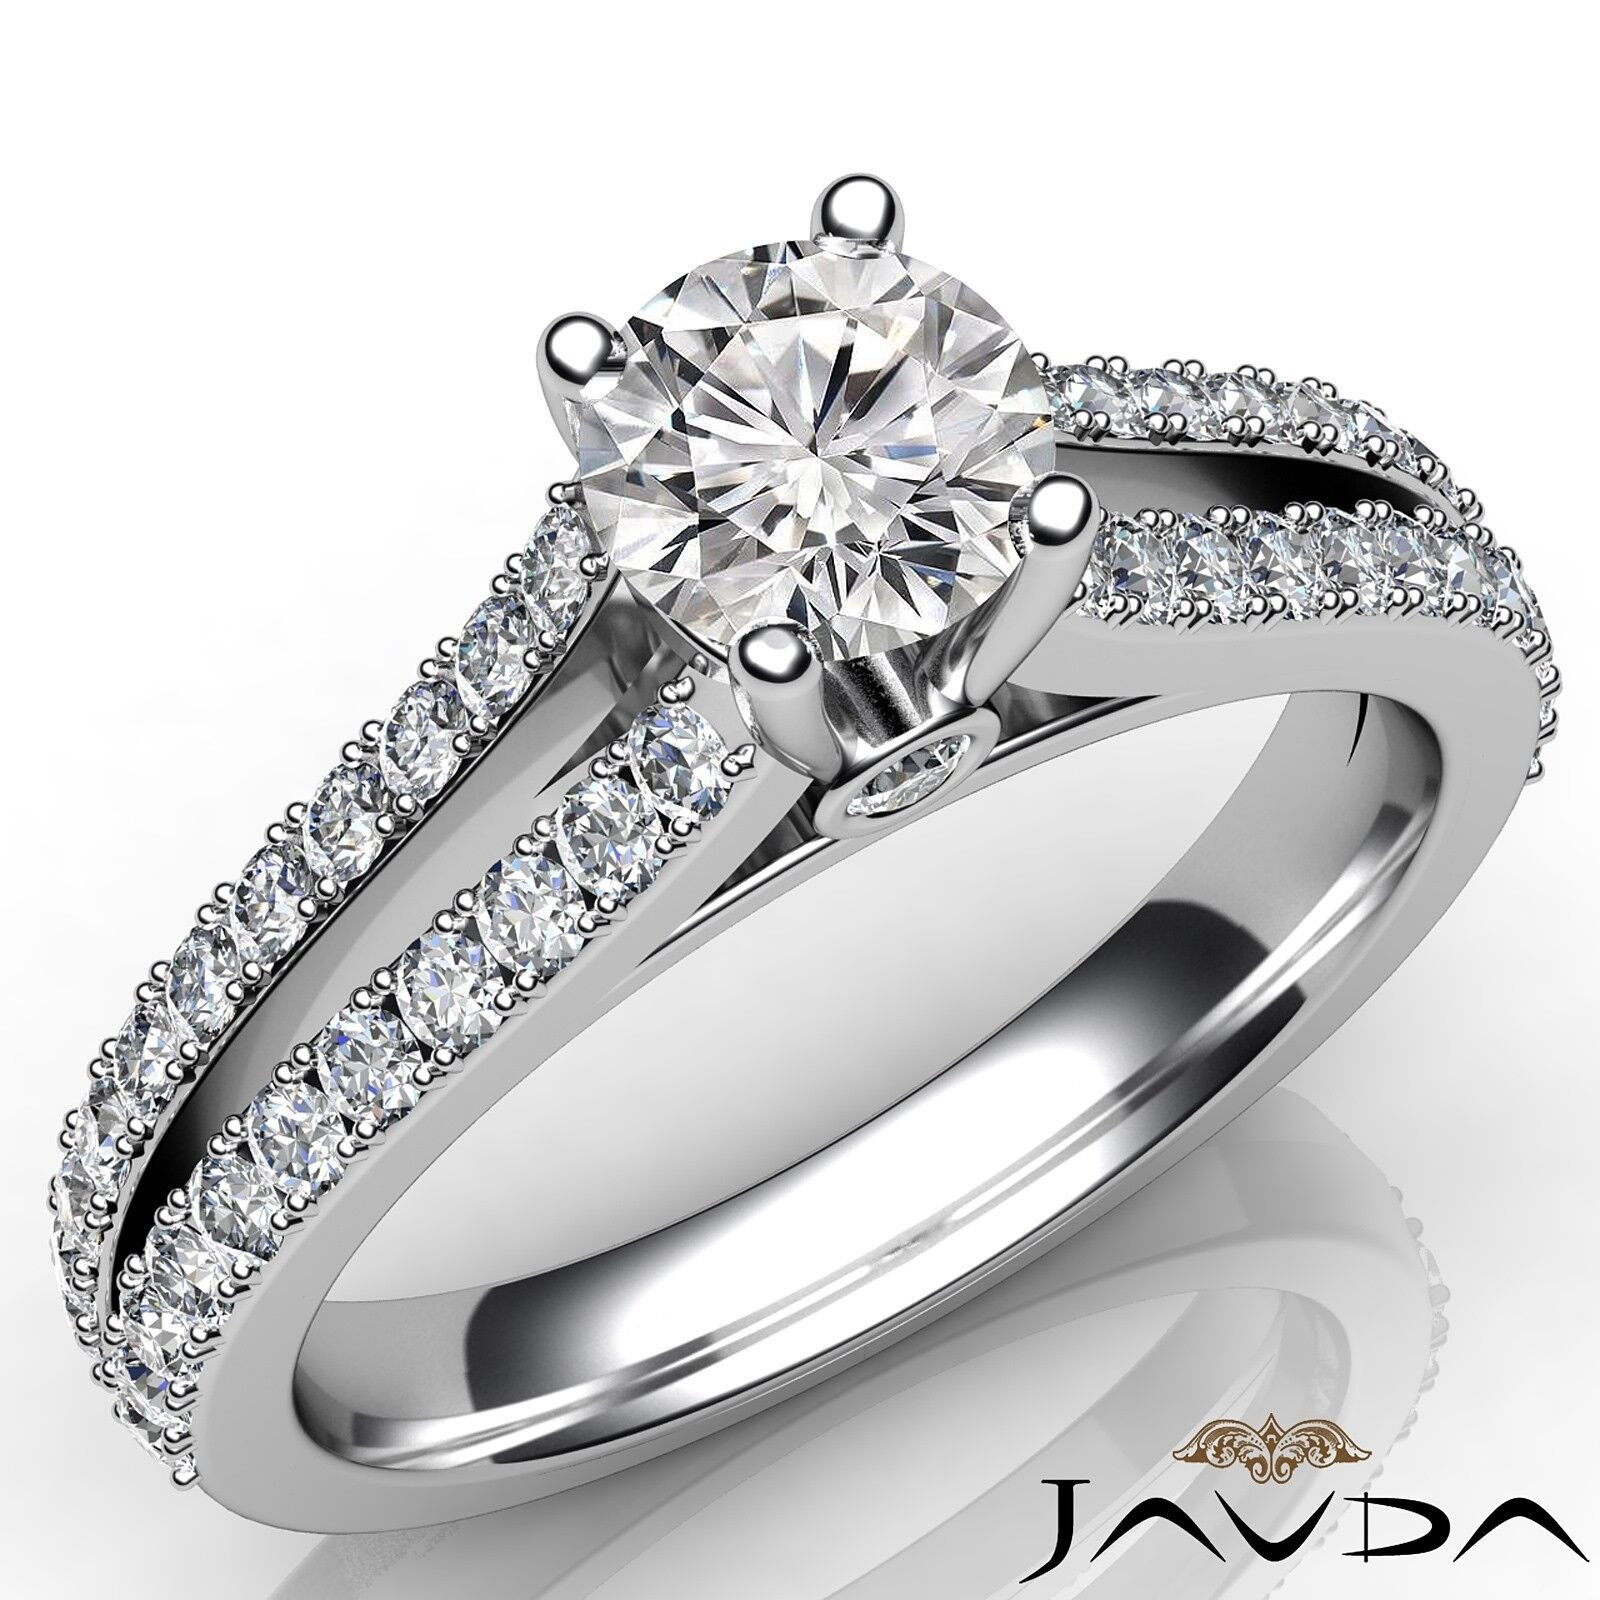 1.15ctw Natural 100% Round Diamond Engagement Ring GIA D-SI1 White Gold Women